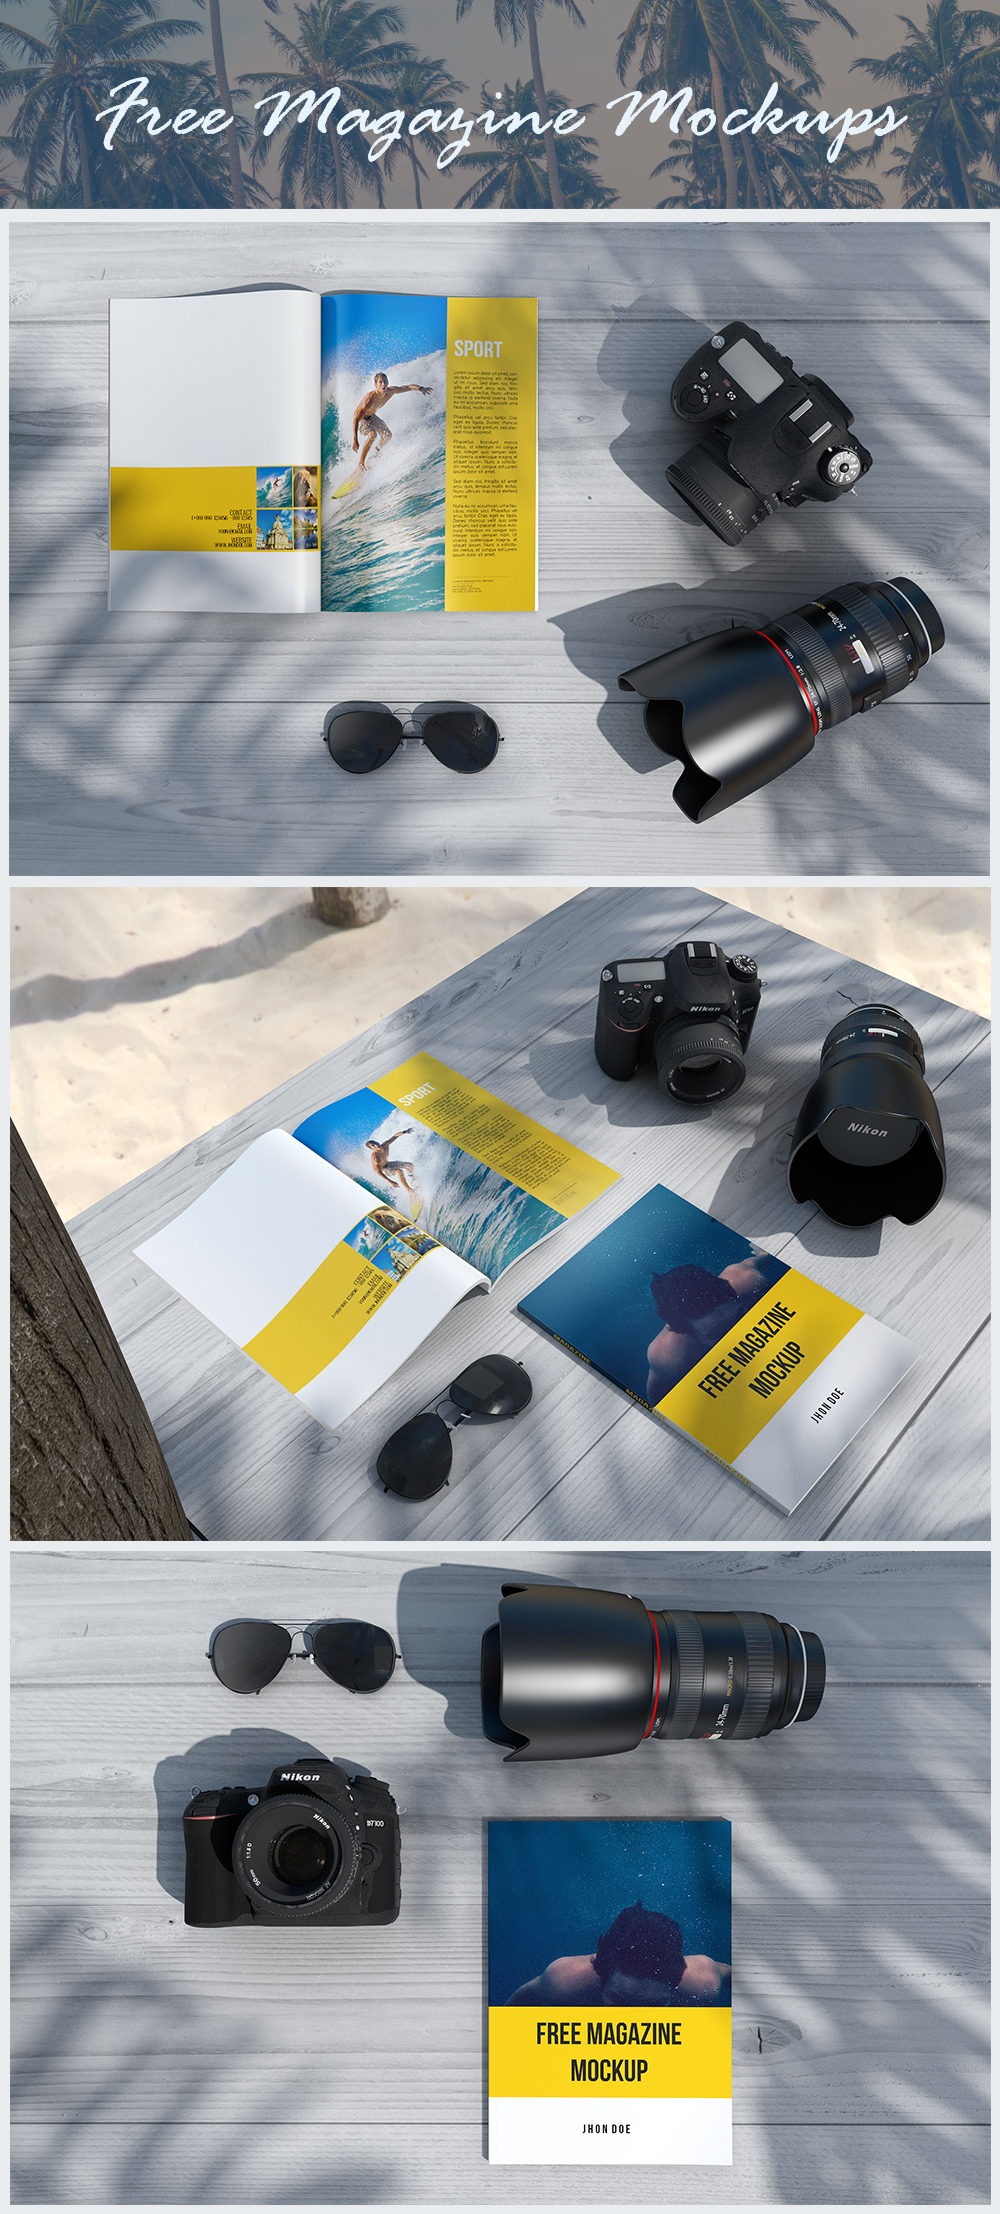 photographer beach magazine free mockups Mockup design graphic pixel freebie psd download Layout template InDesign